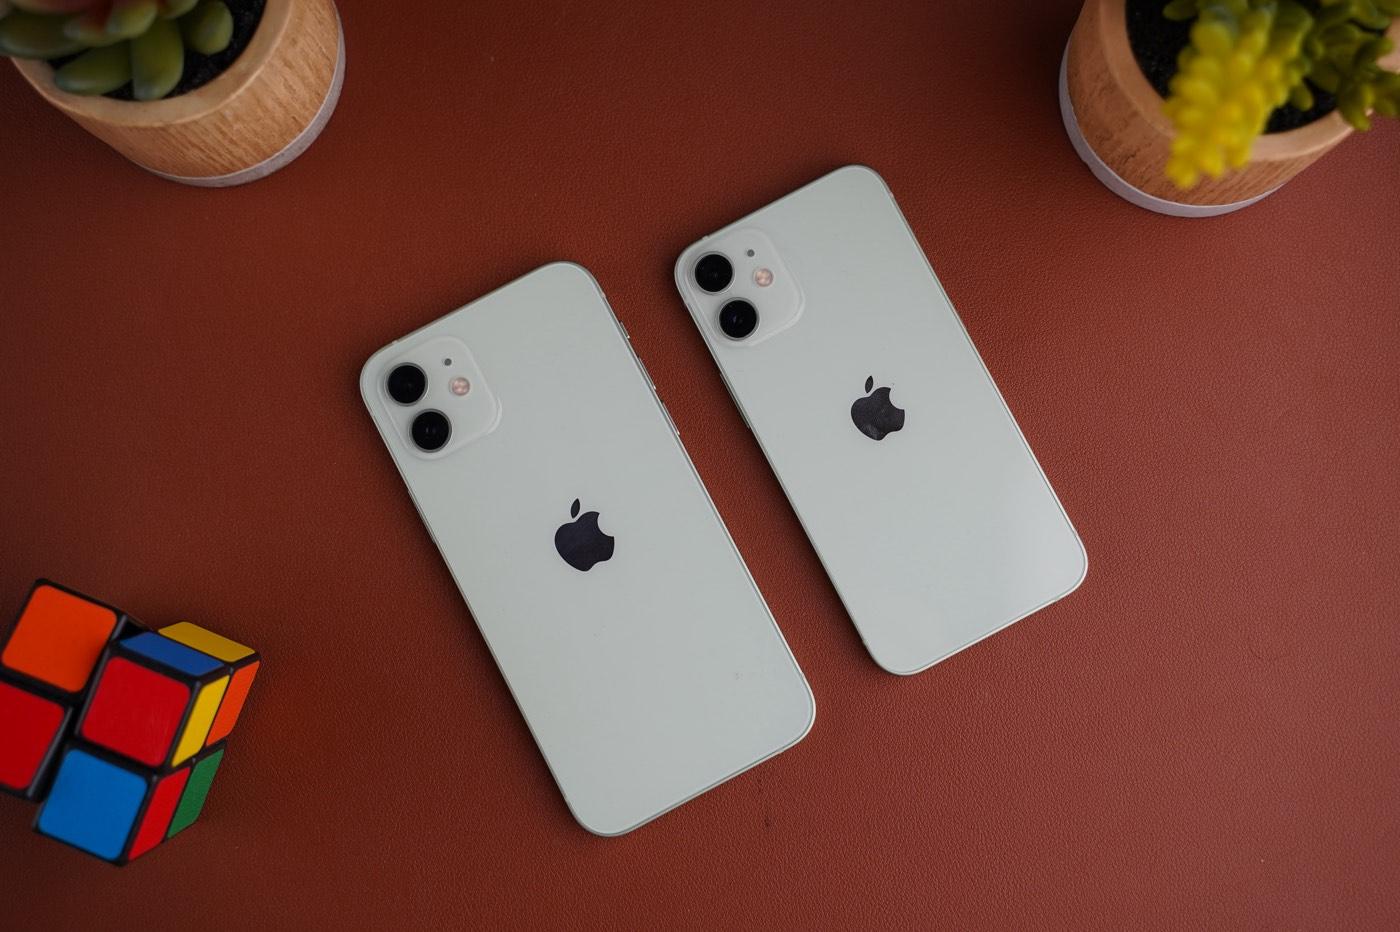 test iphone 12 mini vs 12